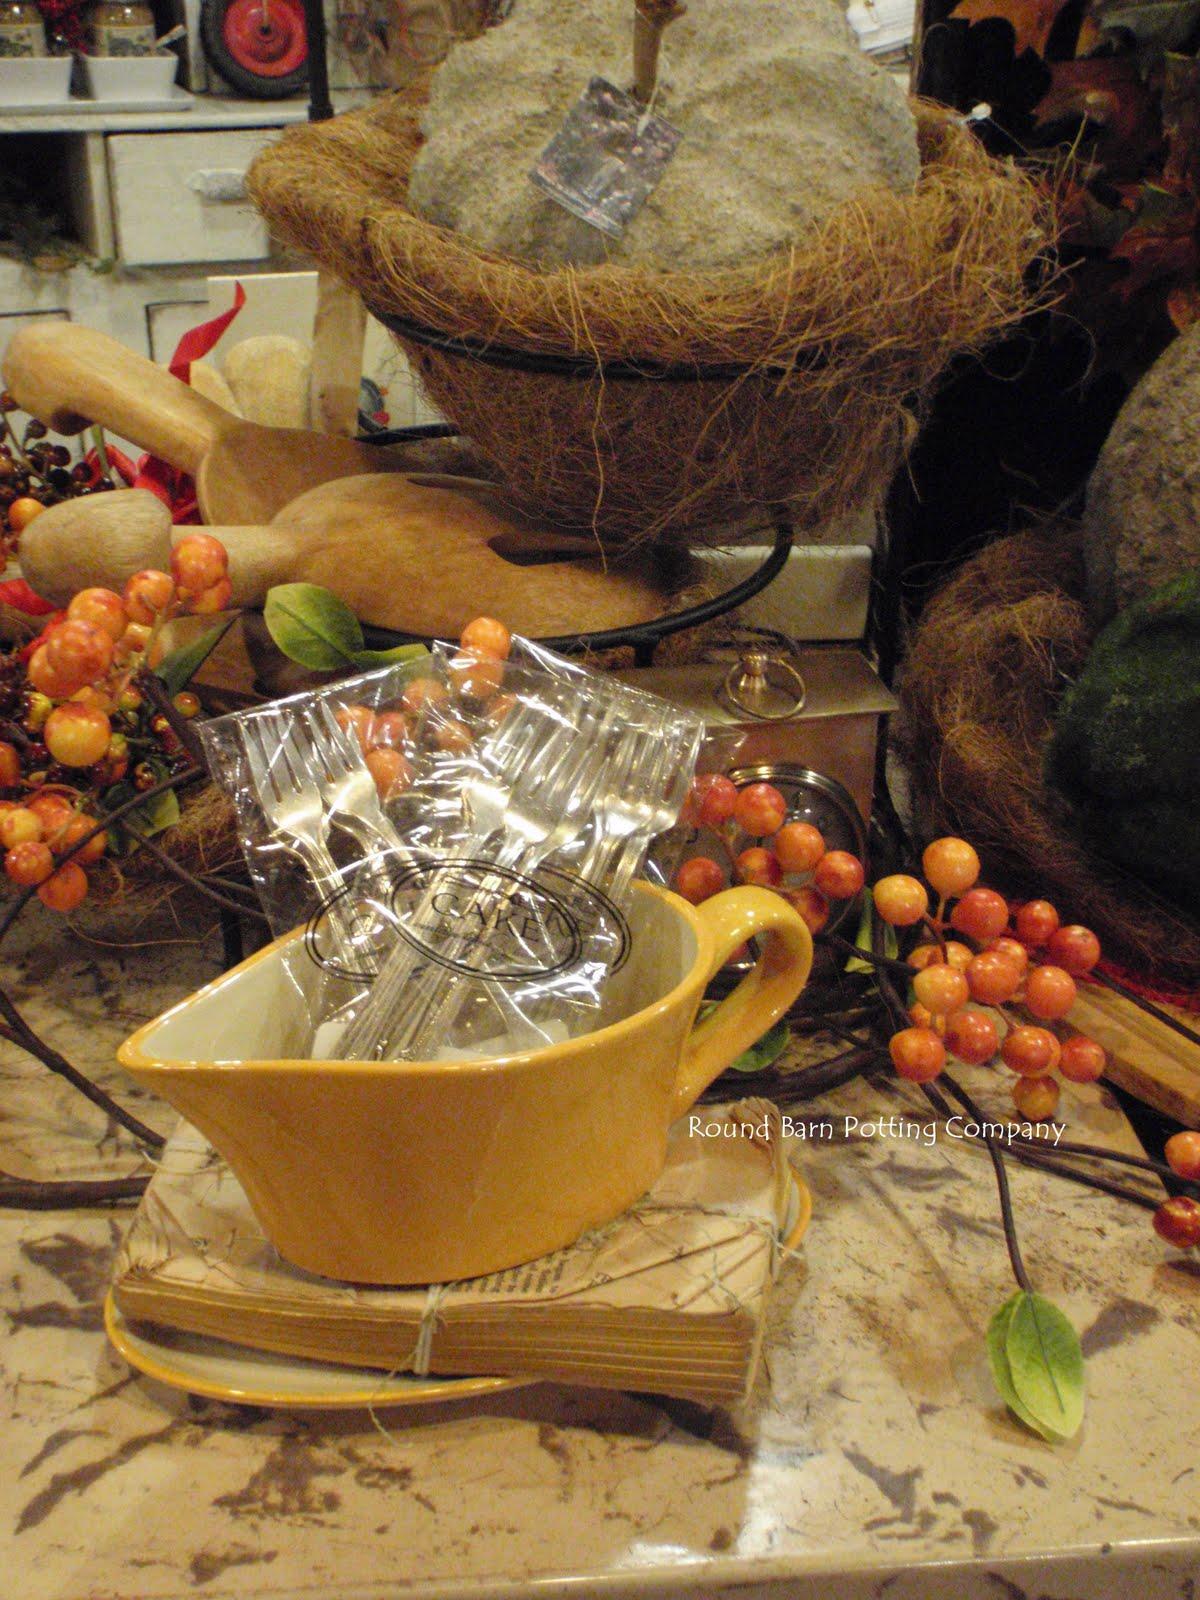 Lori Miller S Round Barn Potting Company Cement Pumpkins